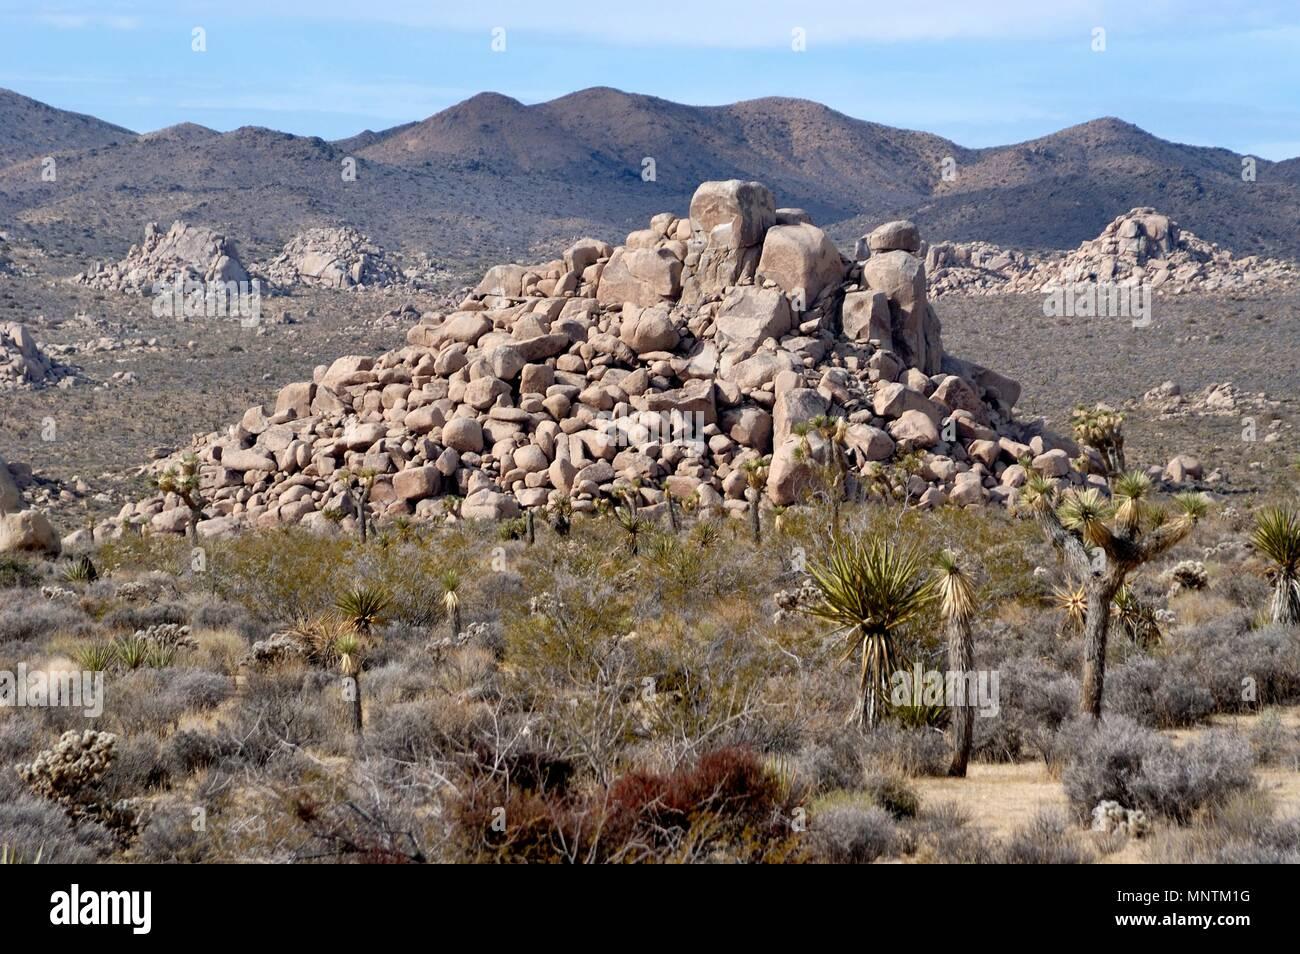 Monzogranite rock pile, Joshua tree, Yucca brevifolia, Yucca palm, Mojave Yucca, Yucca shidigera,  Mojave Desert, Geology Tour Road, 031129_0435 - Stock Image